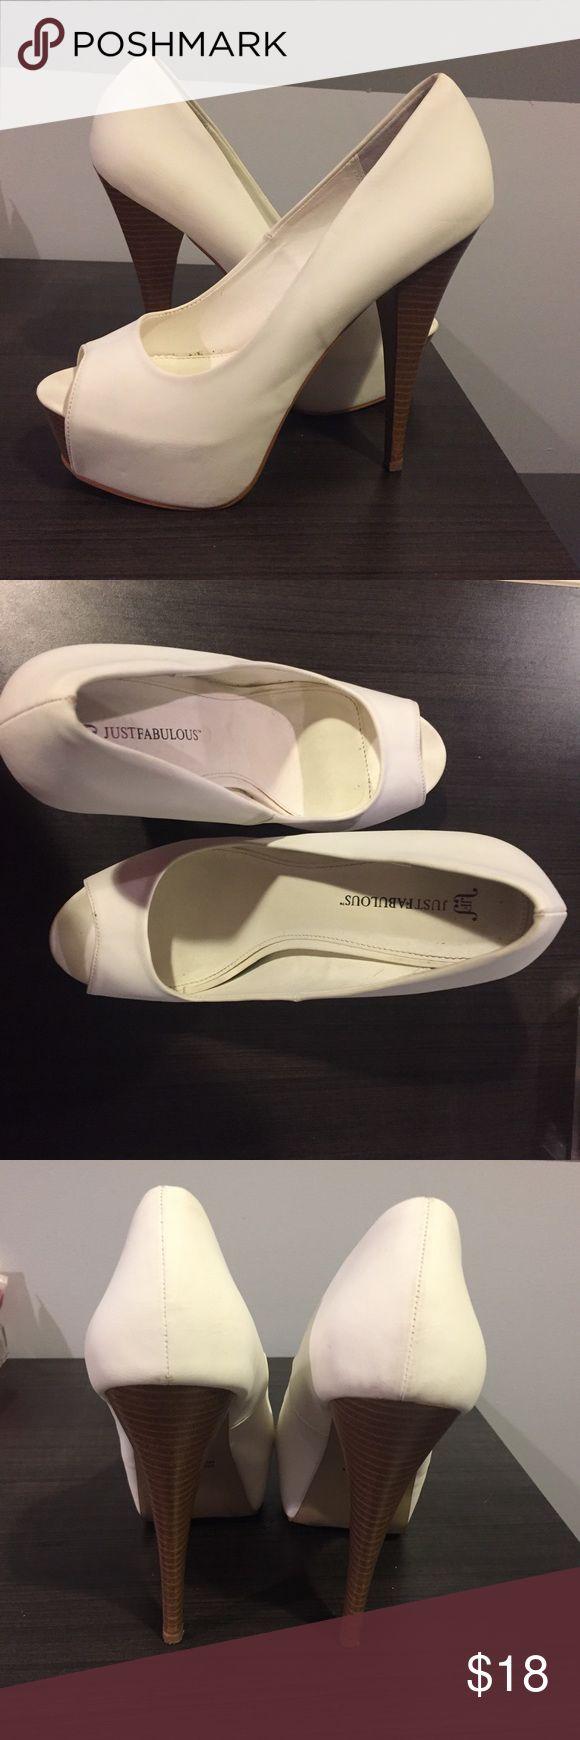 JustFab Peep toe platforms Just Fabulous 6 inch Peep toe white platforms. Worn once. No scuffs. JustFab Shoes Platforms